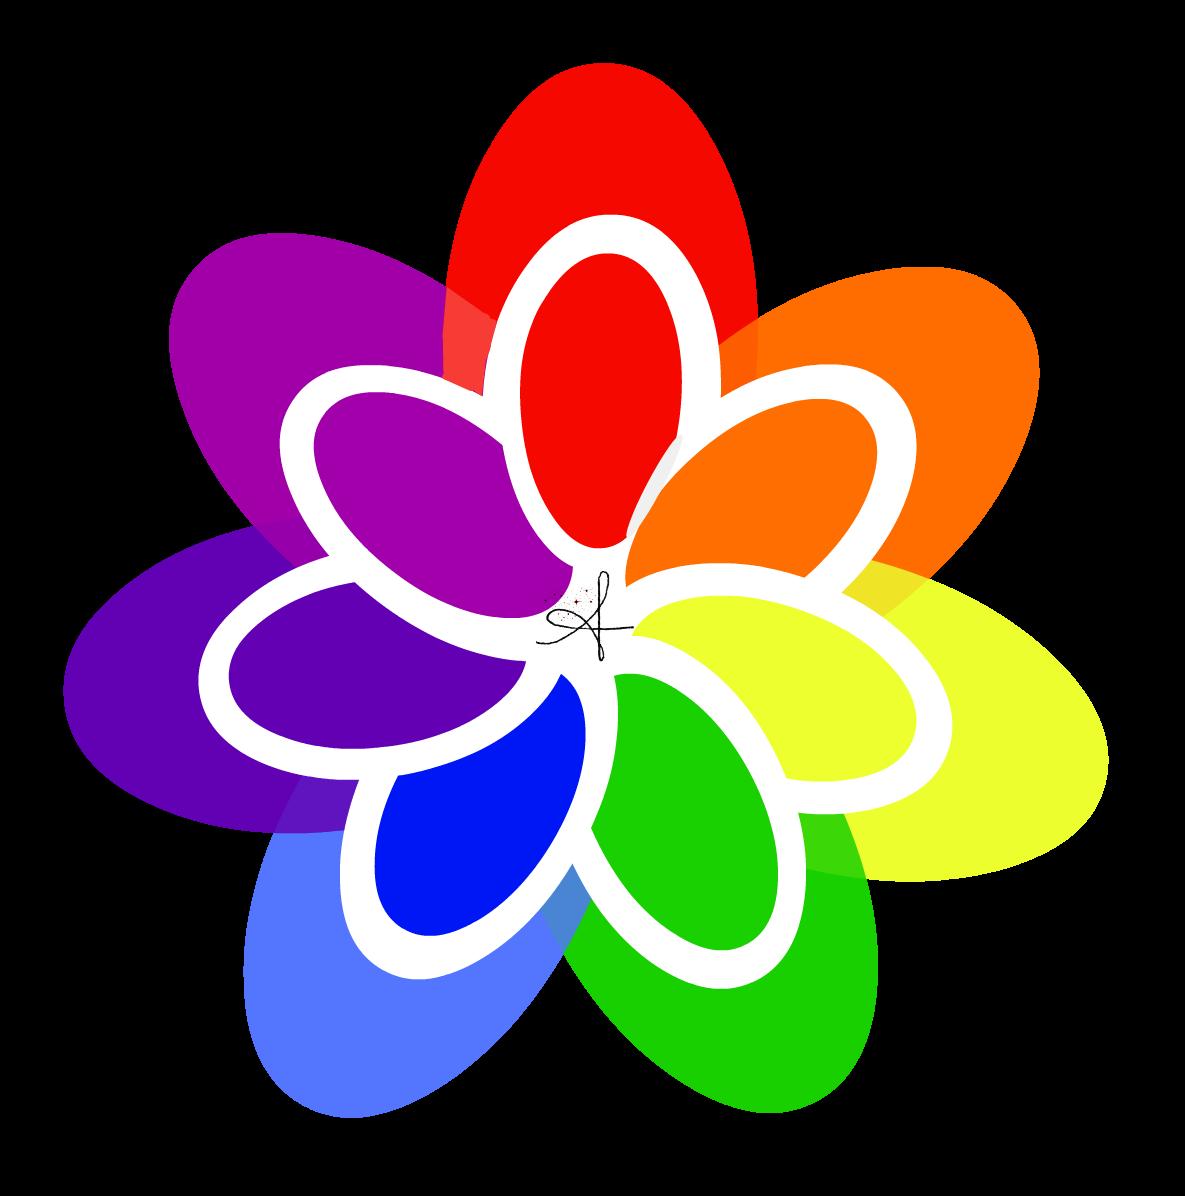 rr-rainbow-flower-w.png